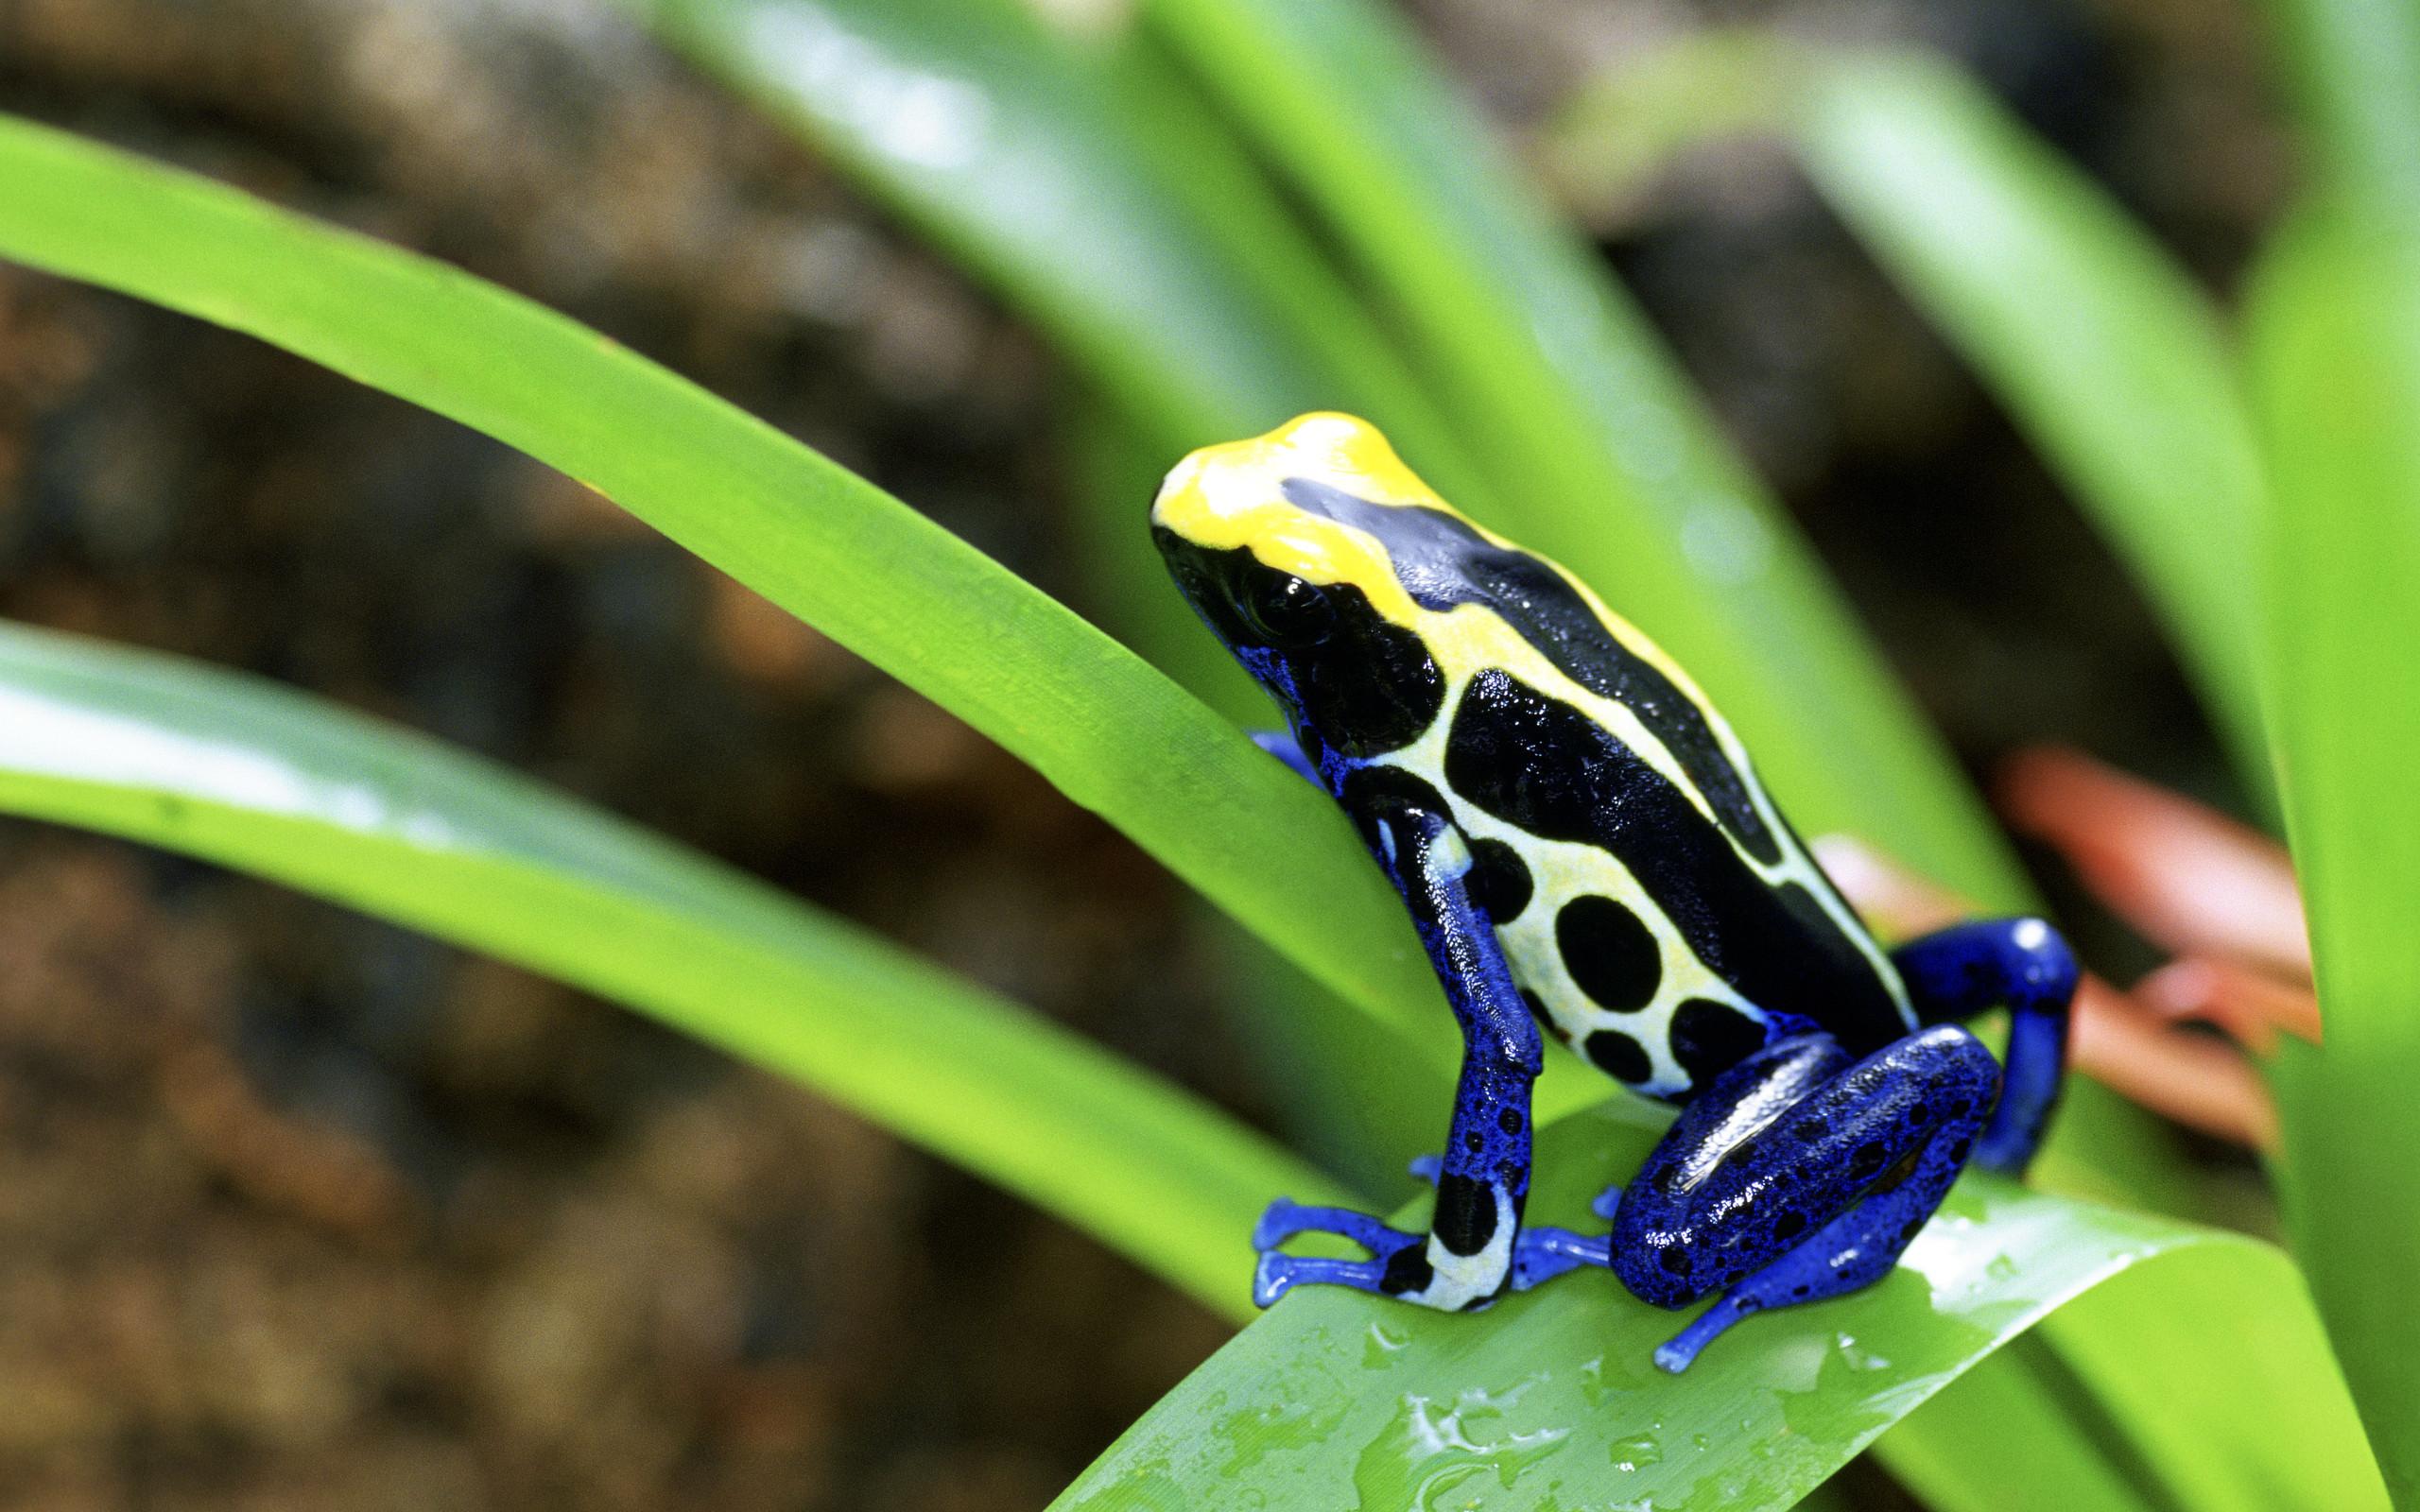 Res: 2560x1600, Animal - Poison dart frog Wallpaper